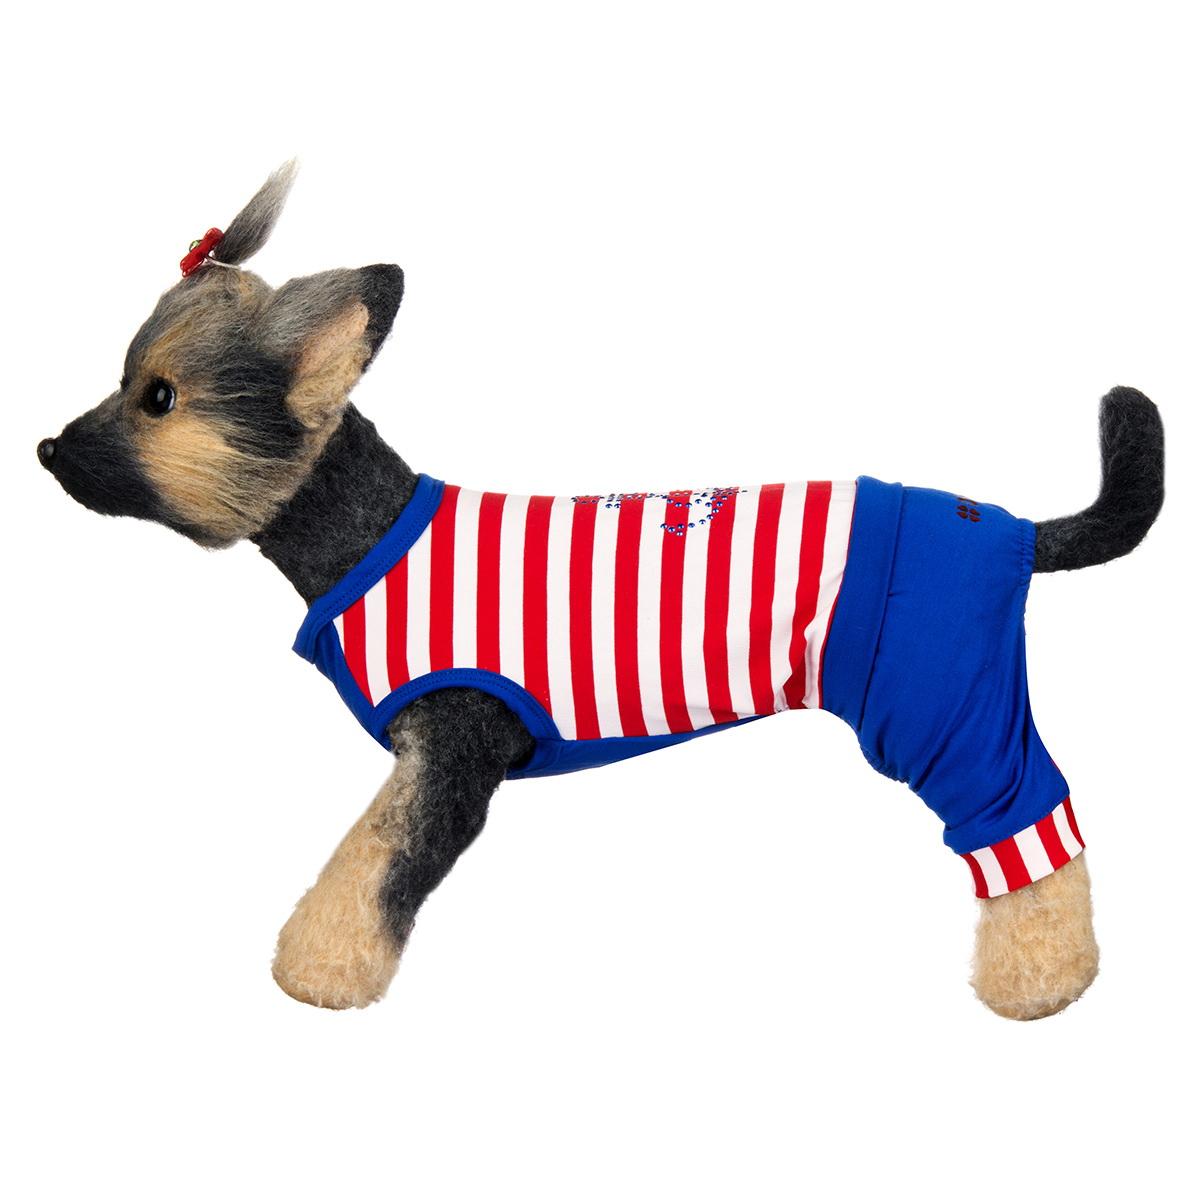 "Комбинезон для собак Dogmoda ""Круиз"", унисекс, цвет: красный, синий, белый. Размер 1 (S)"